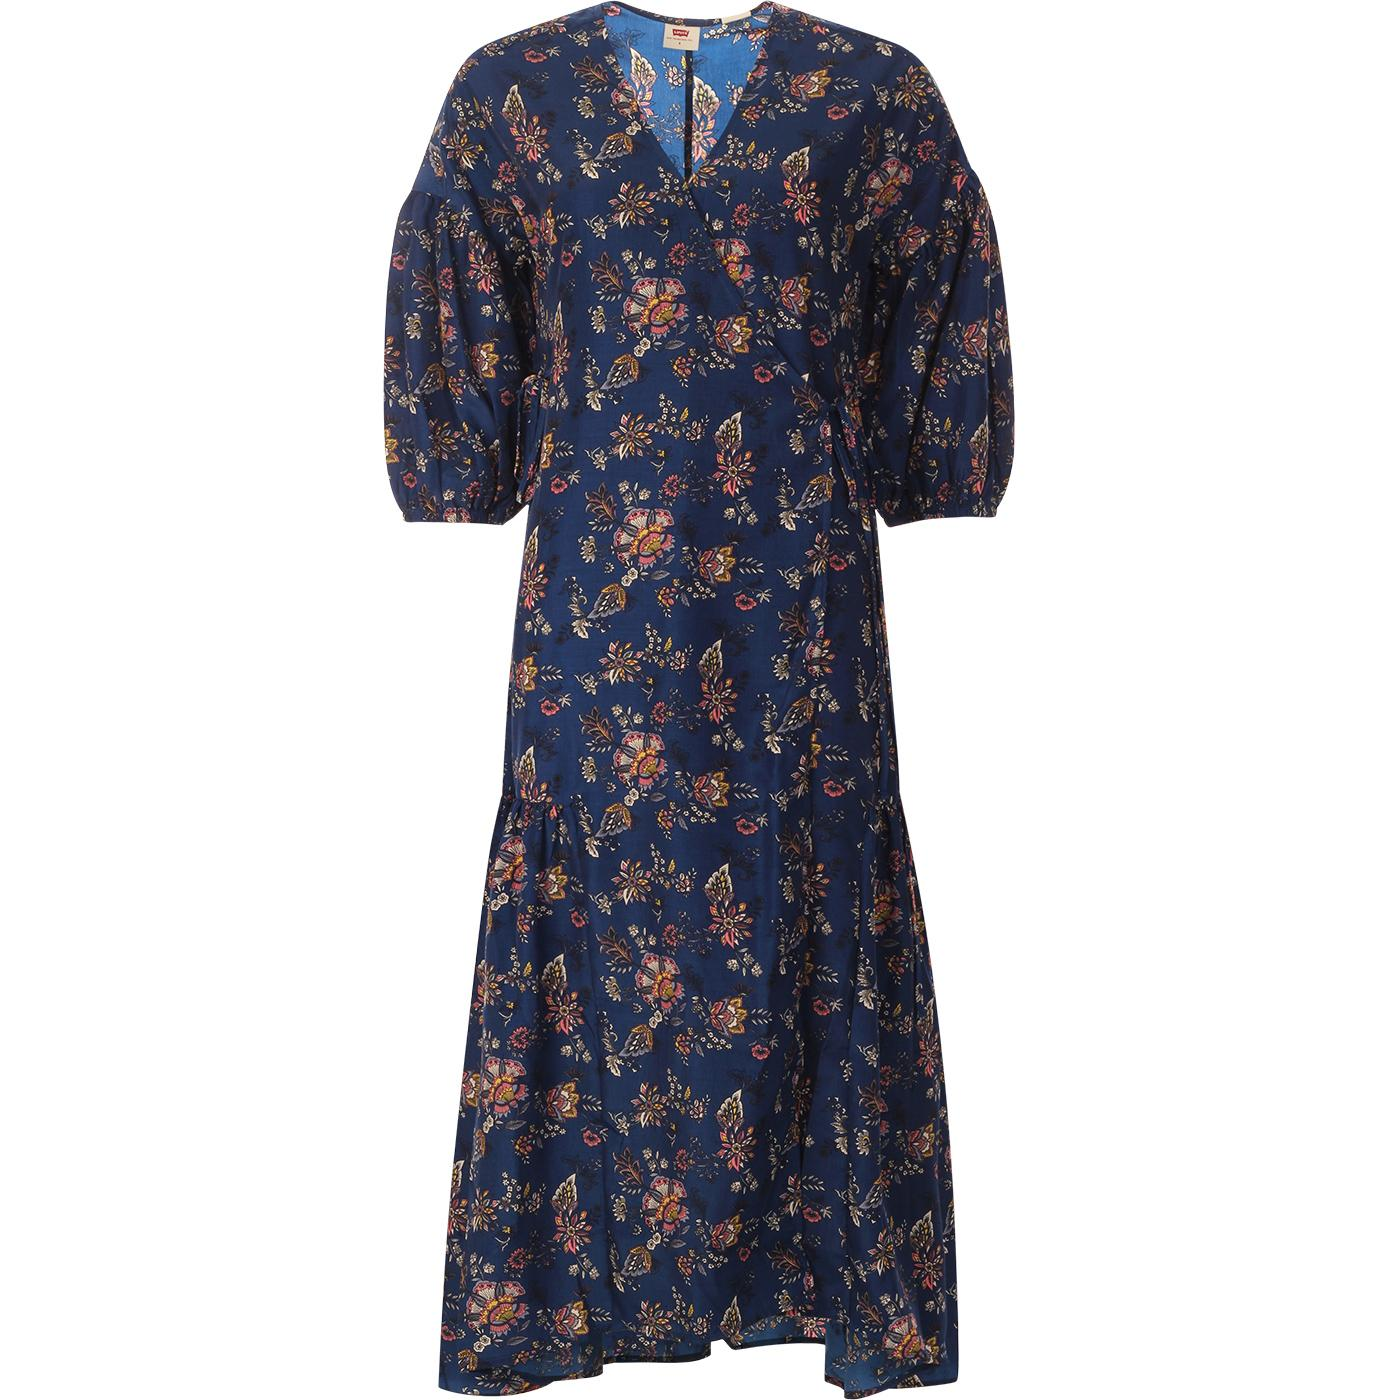 LEVI'S Blair Retro 60s Jacobean Paisley Wrap Dress